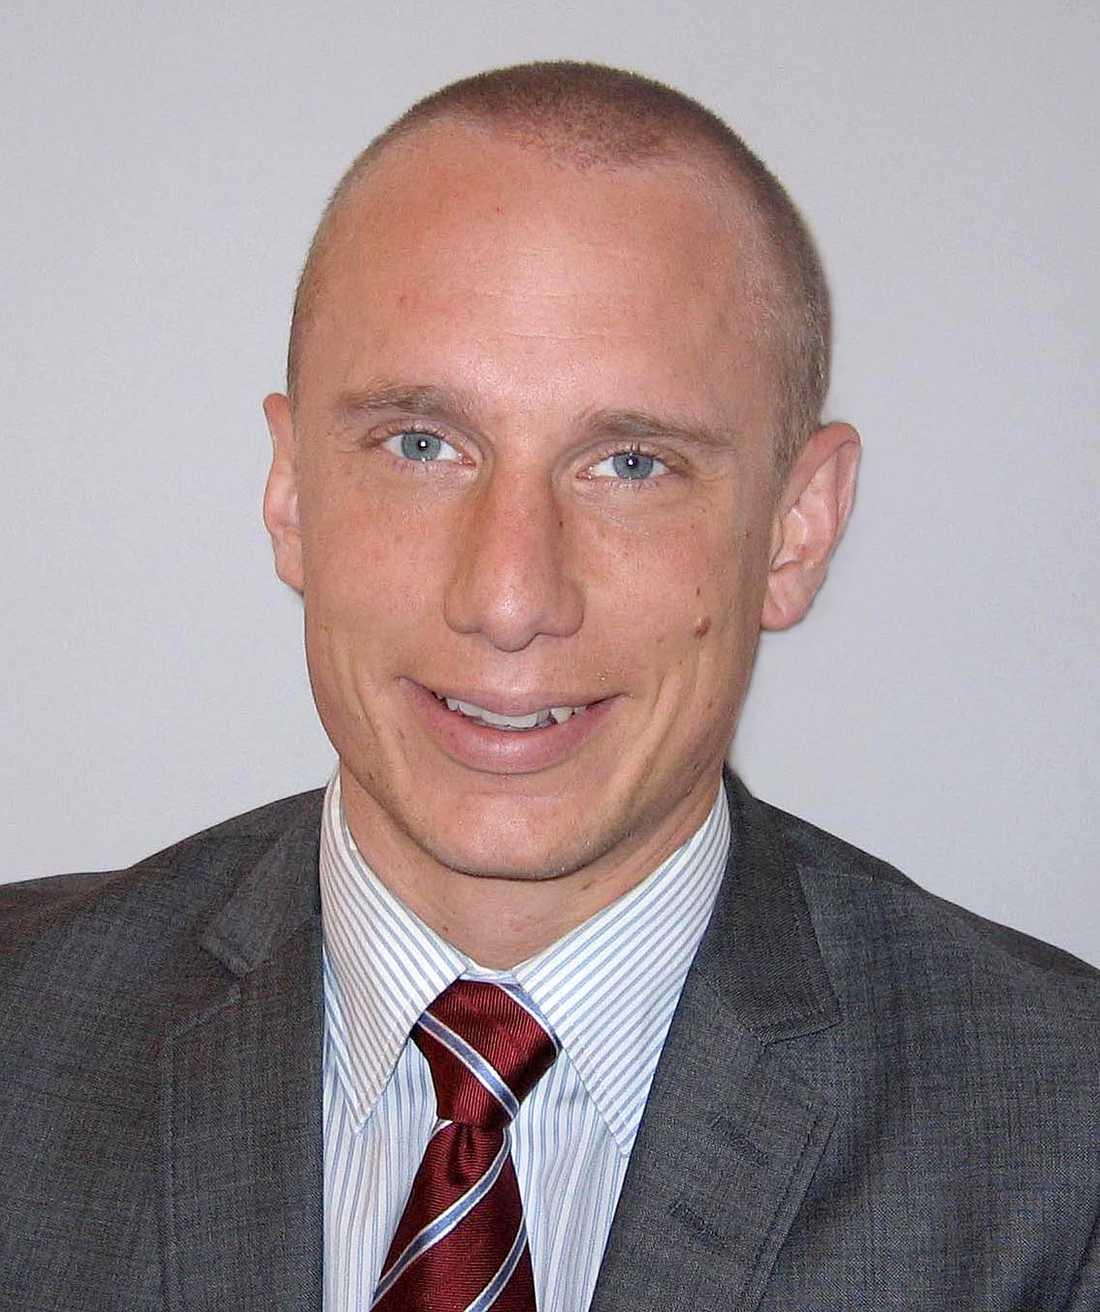 Henrik Erlandsson, rekryteringskonsult på Proffice